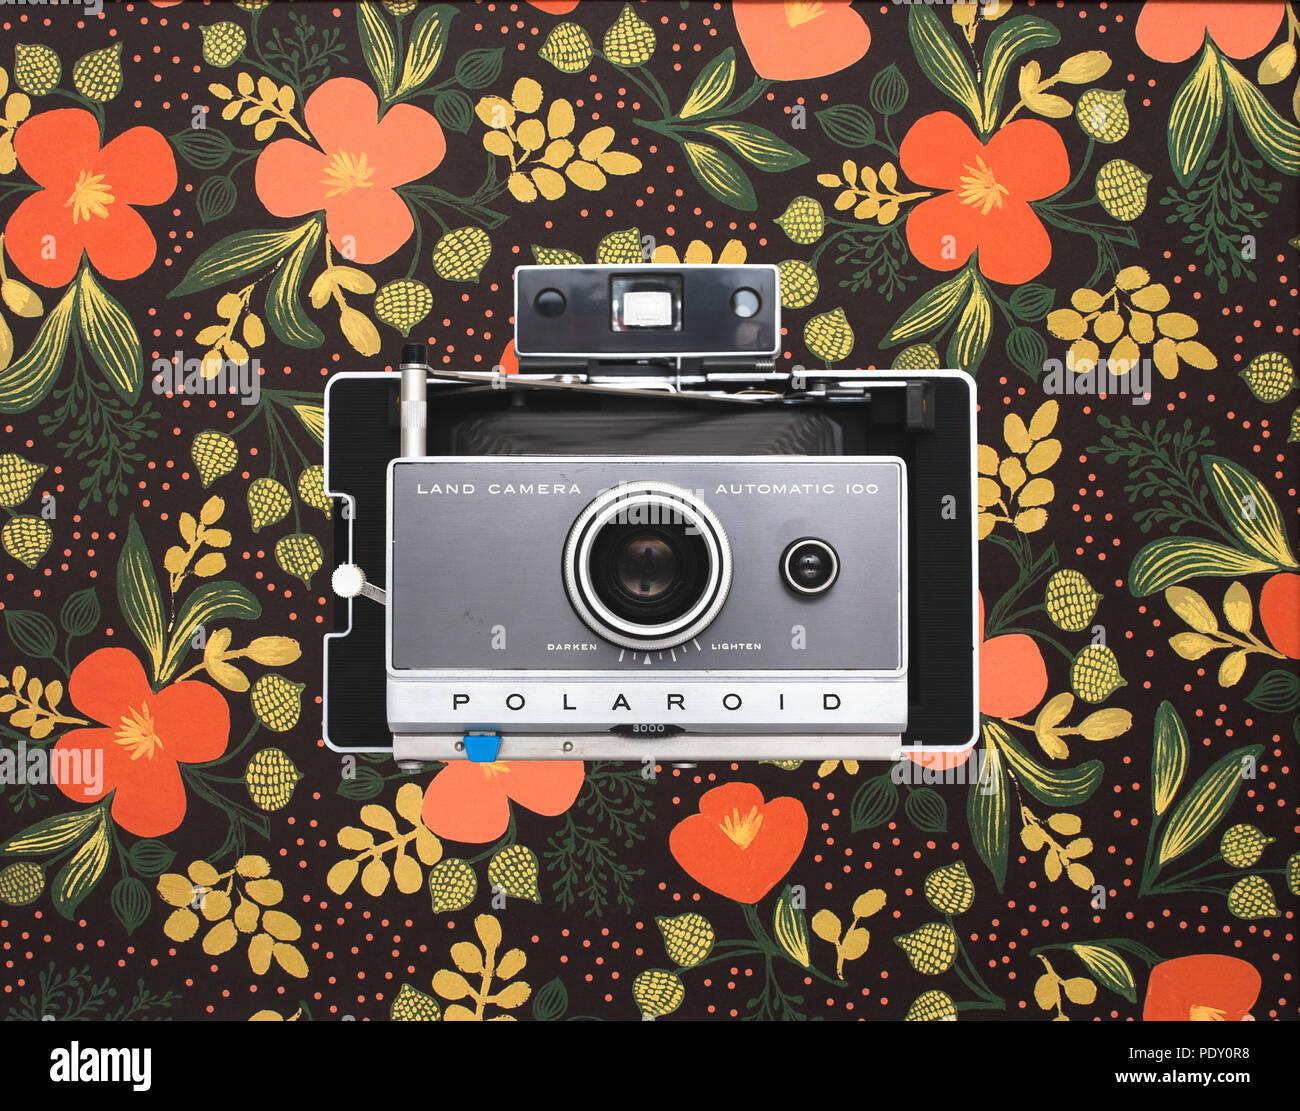 Polaroid camera on floral background - Stock Image